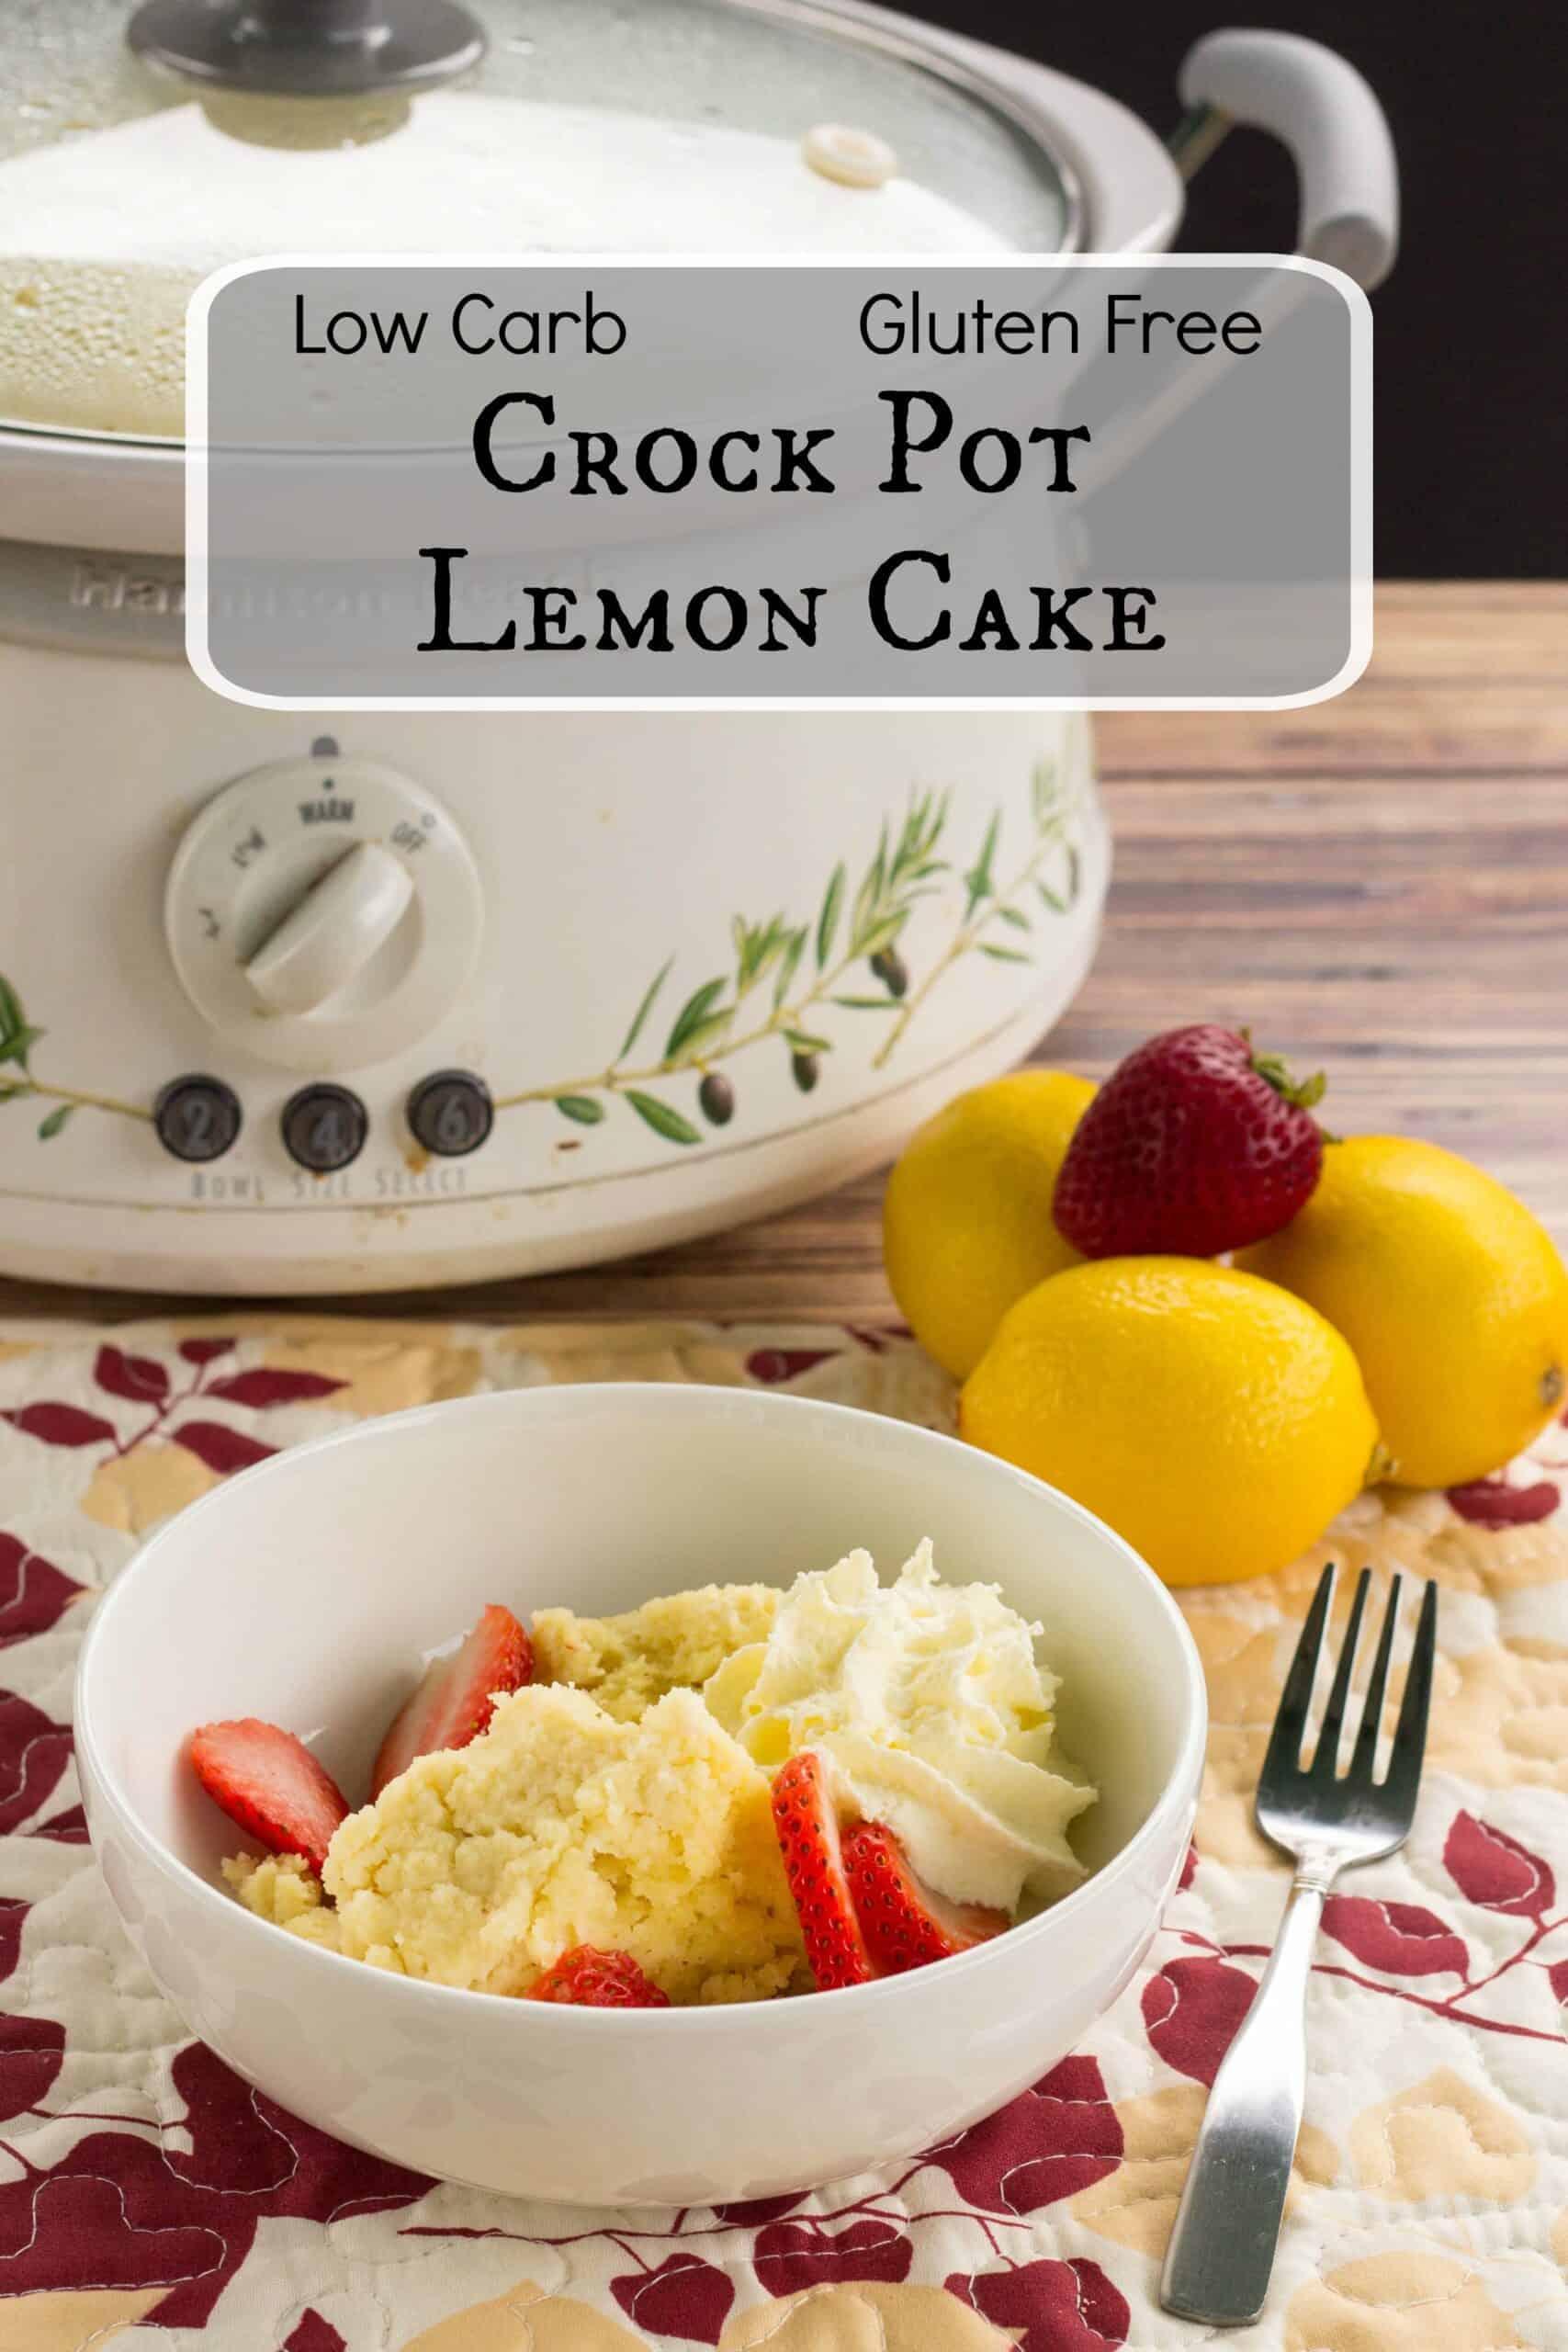 crock pot lemon cake dessert pintrest image